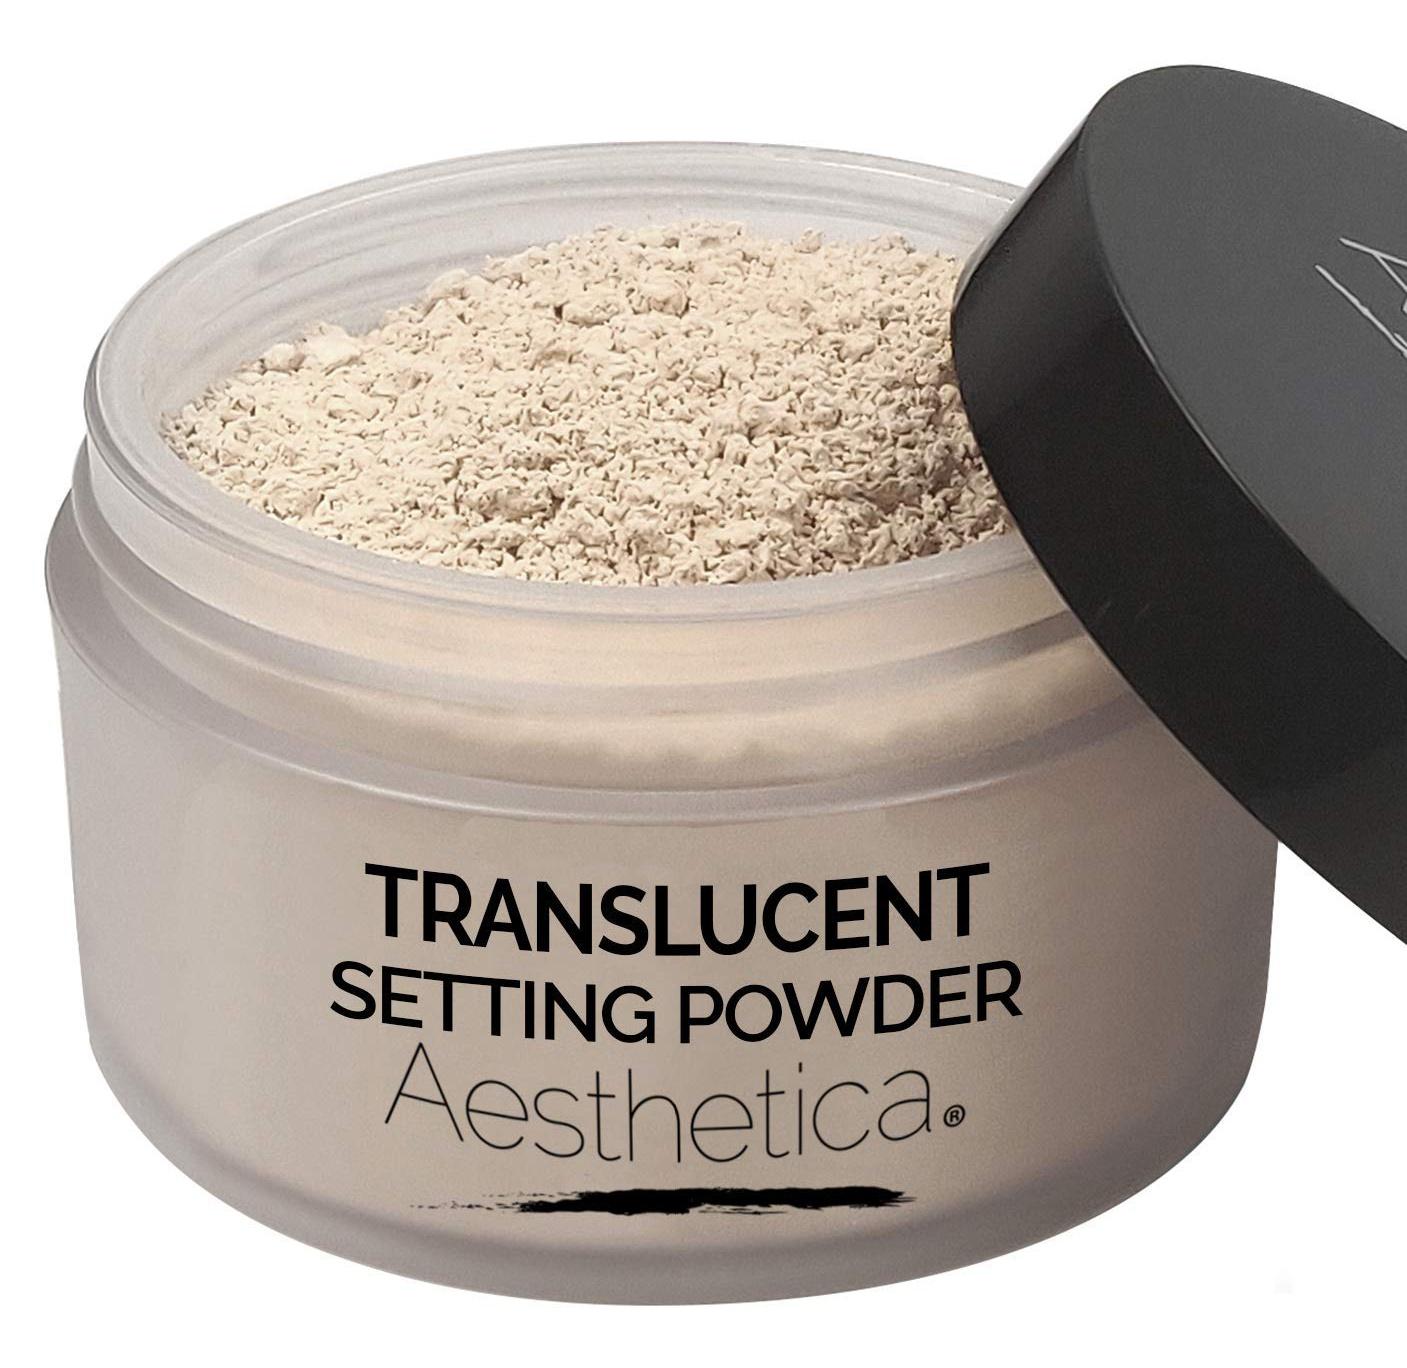 Aesthetica cosmetics Translucent Setting Powder